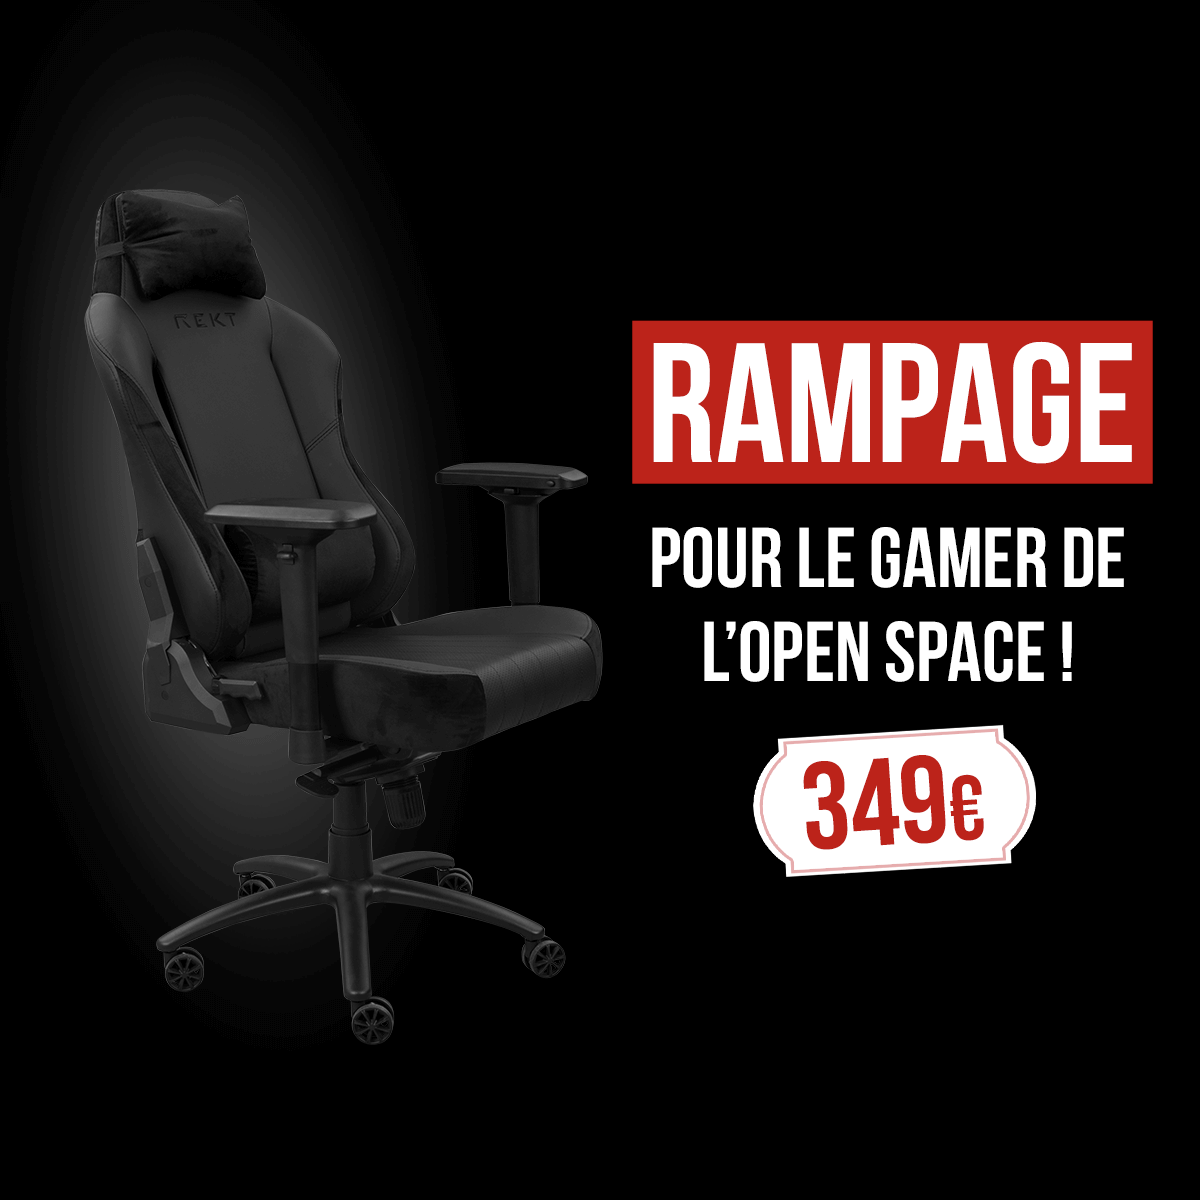 RAMPAGE Comfort